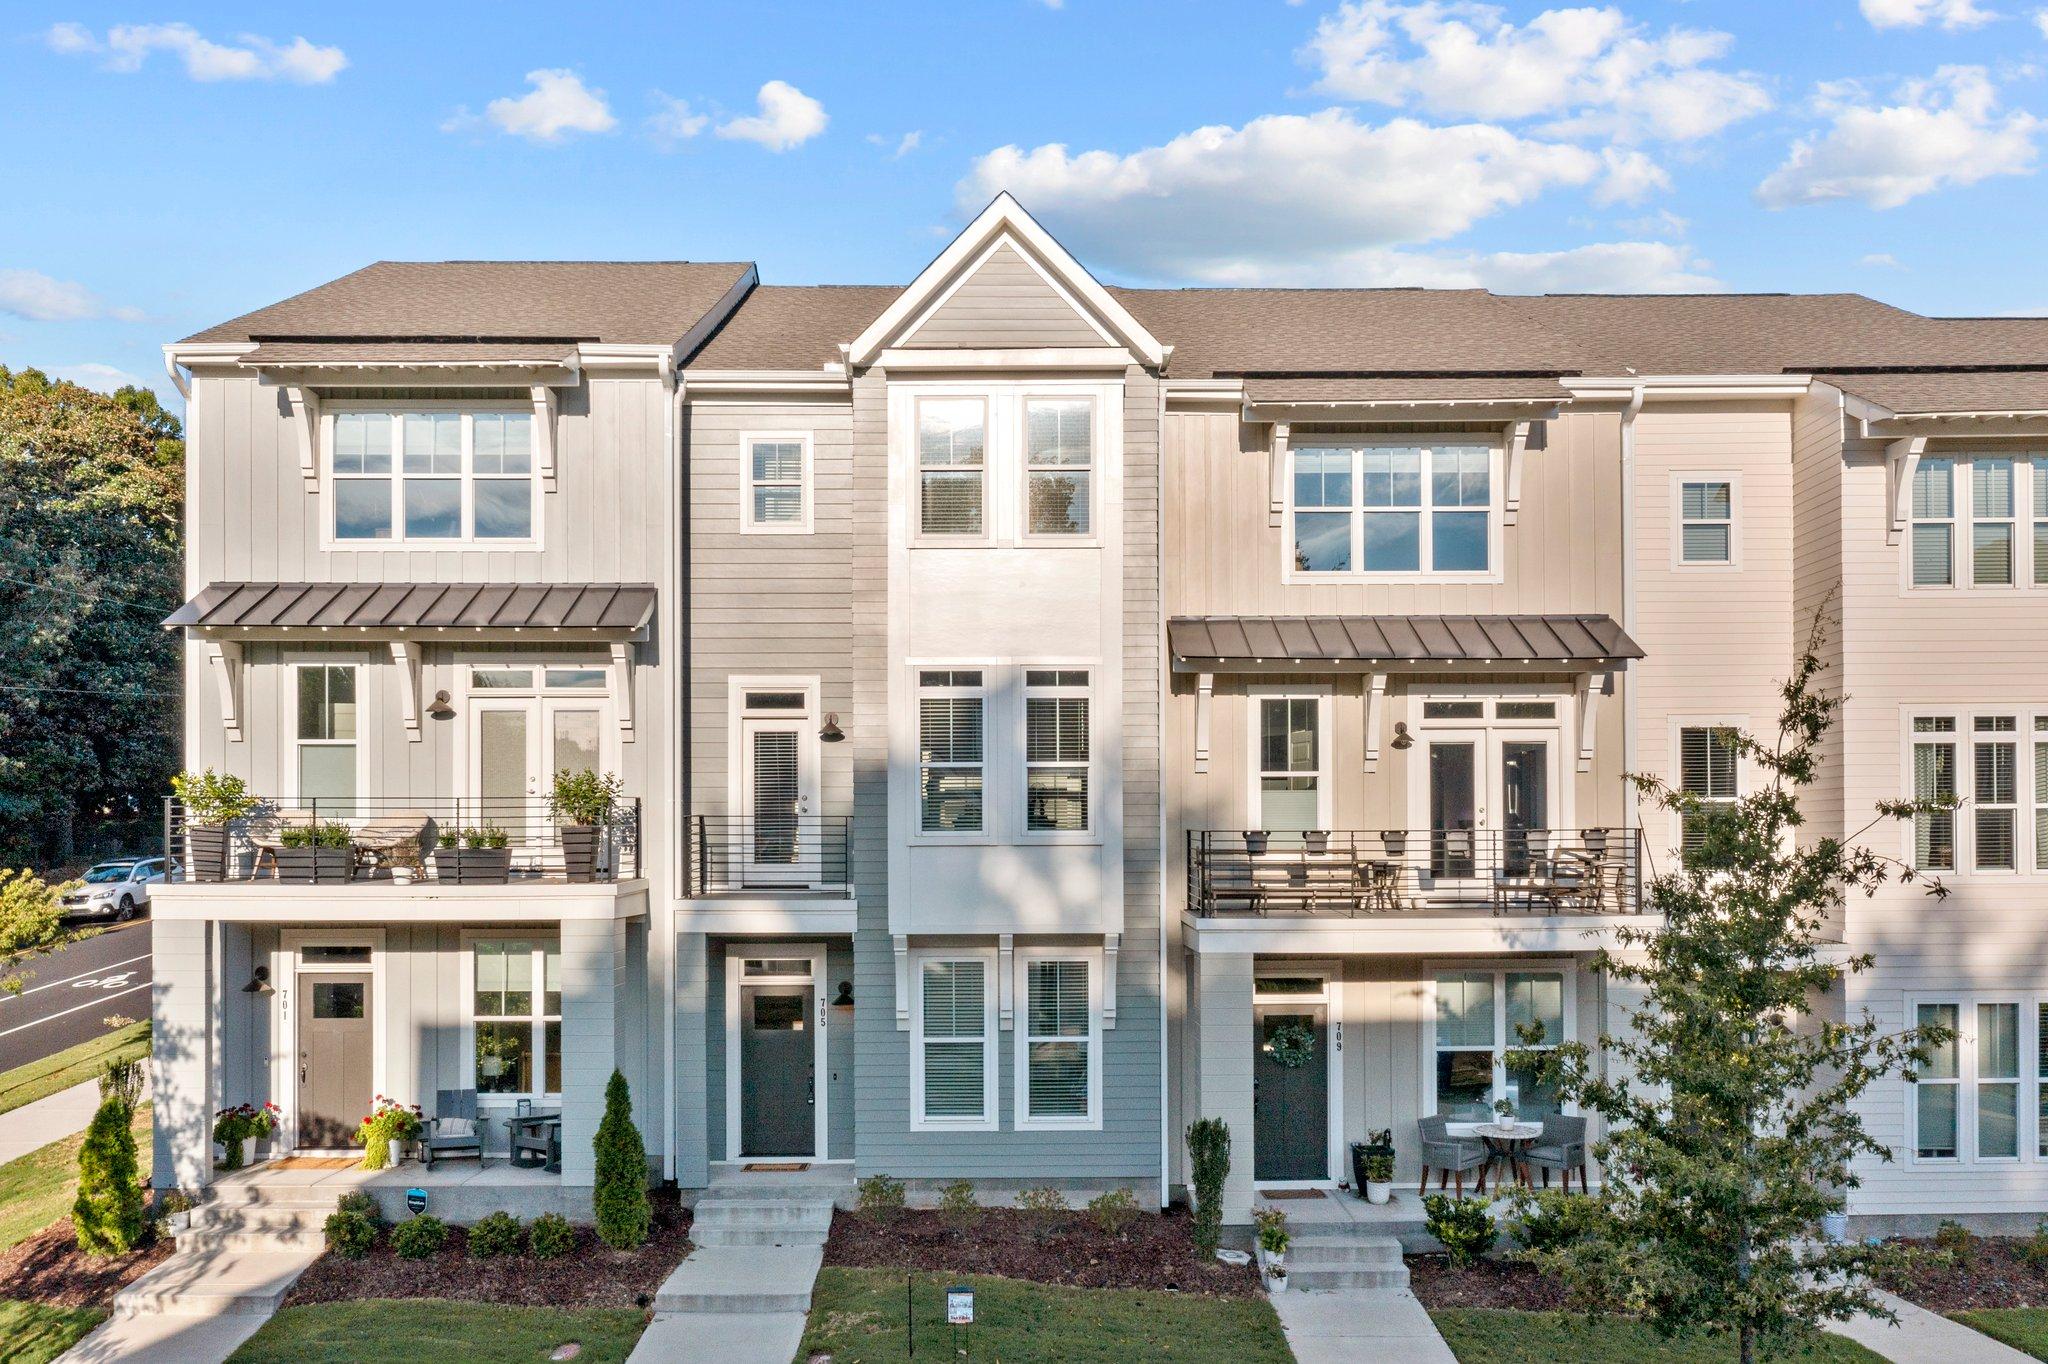 705 Peakland Pl, Raleigh, NC 27604, USA